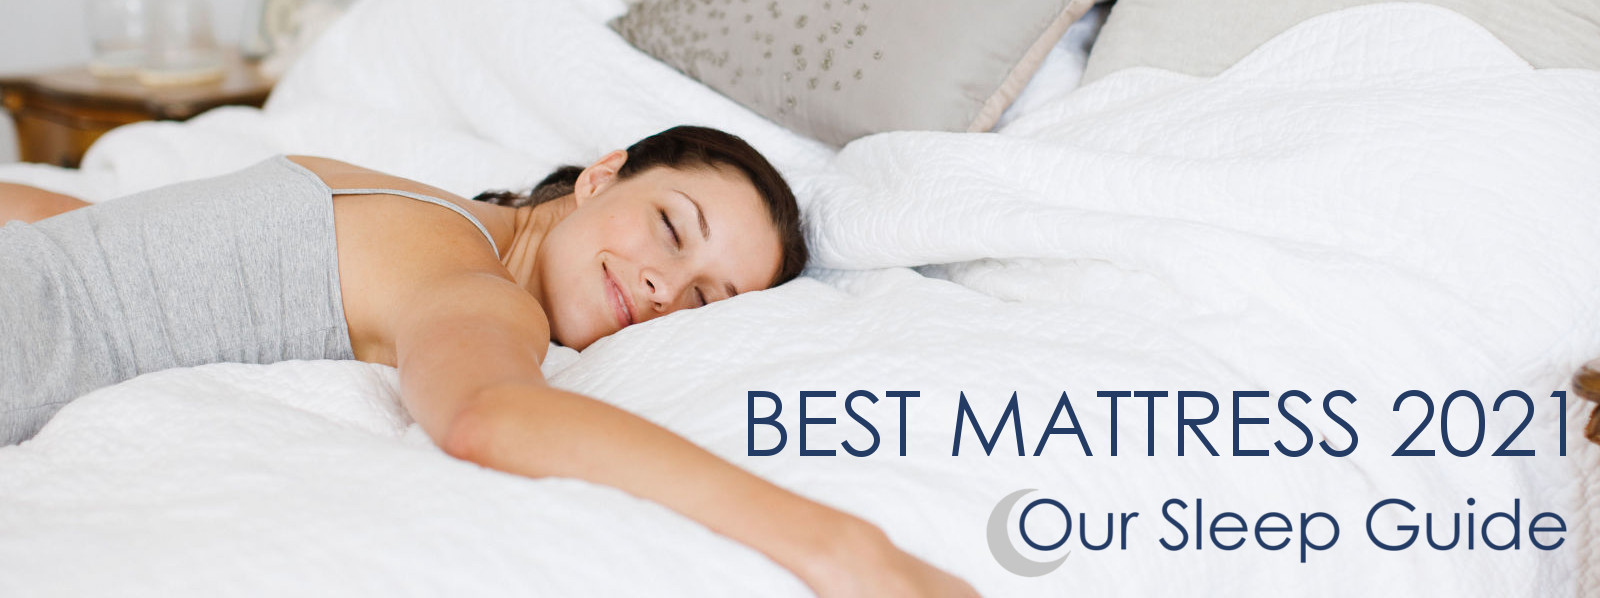 best mattresses 2021